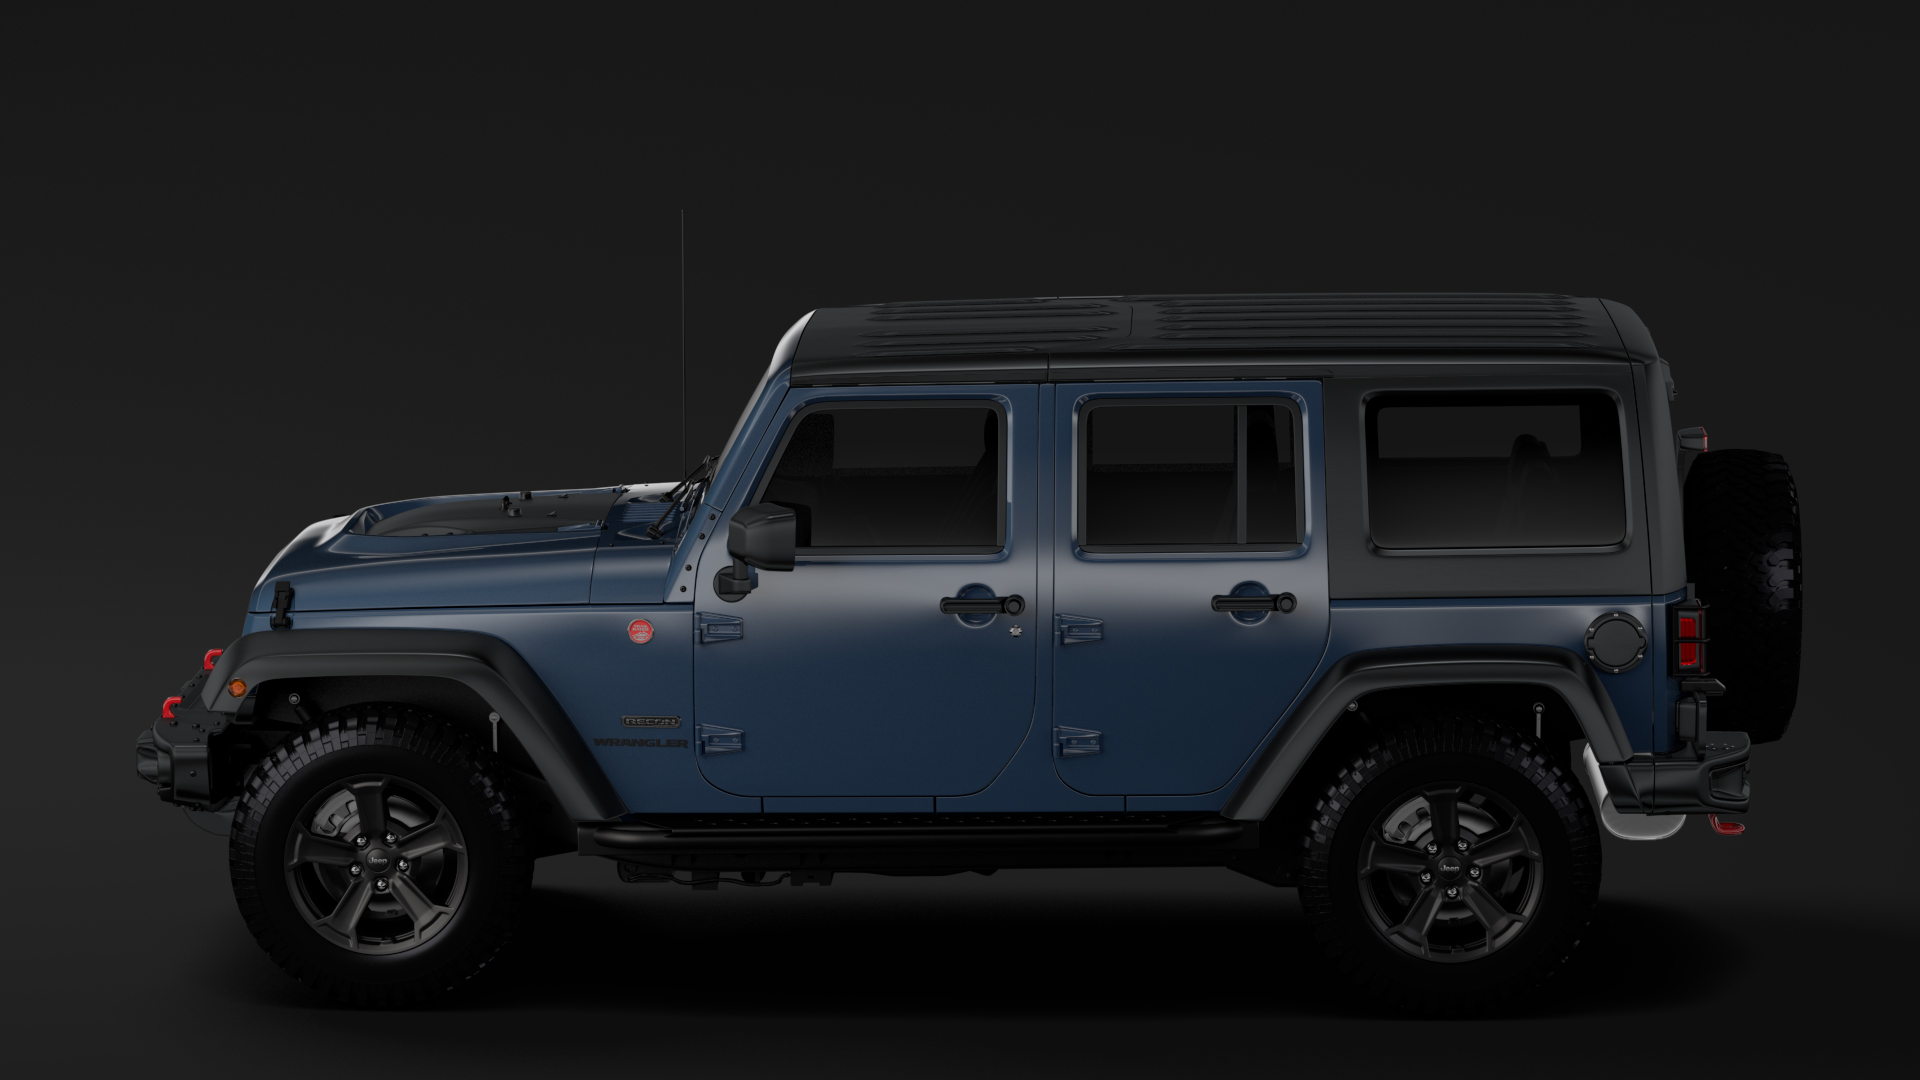 jeep wrangler unlimited rubicon recon jk 2017 3d model max fbx c4d lwo ma mb hrc xsi obj 277002